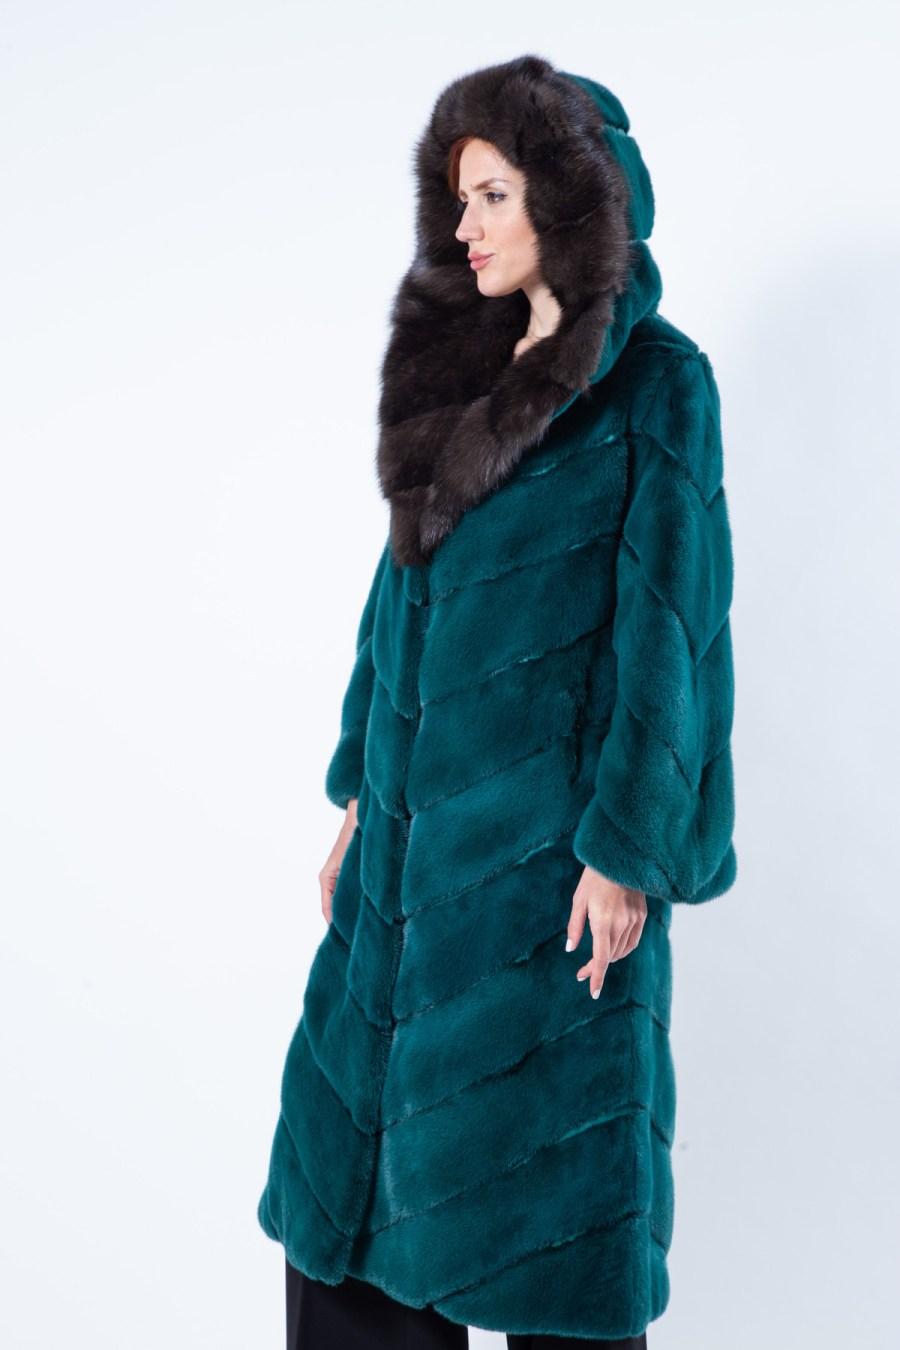 Ferre Shock Green Mink Coat with Hood - Sarigianni Furs